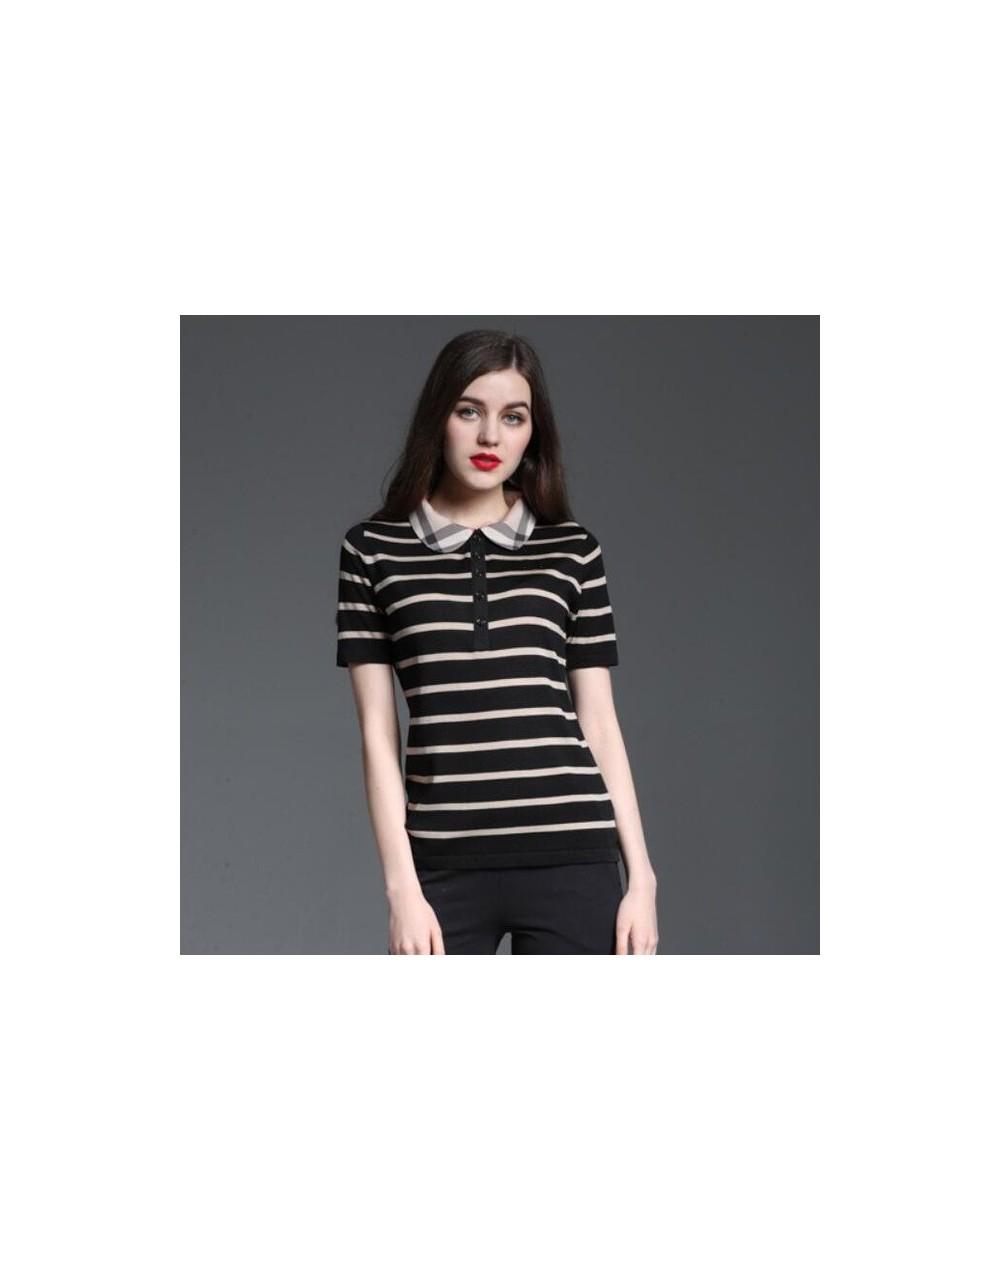 Polo Shirt Women Short Sleeve Summer Striped Casual Shirt Luxury Brand Slim Fashion Tops Camisa Polo Feminina Female Clothes...